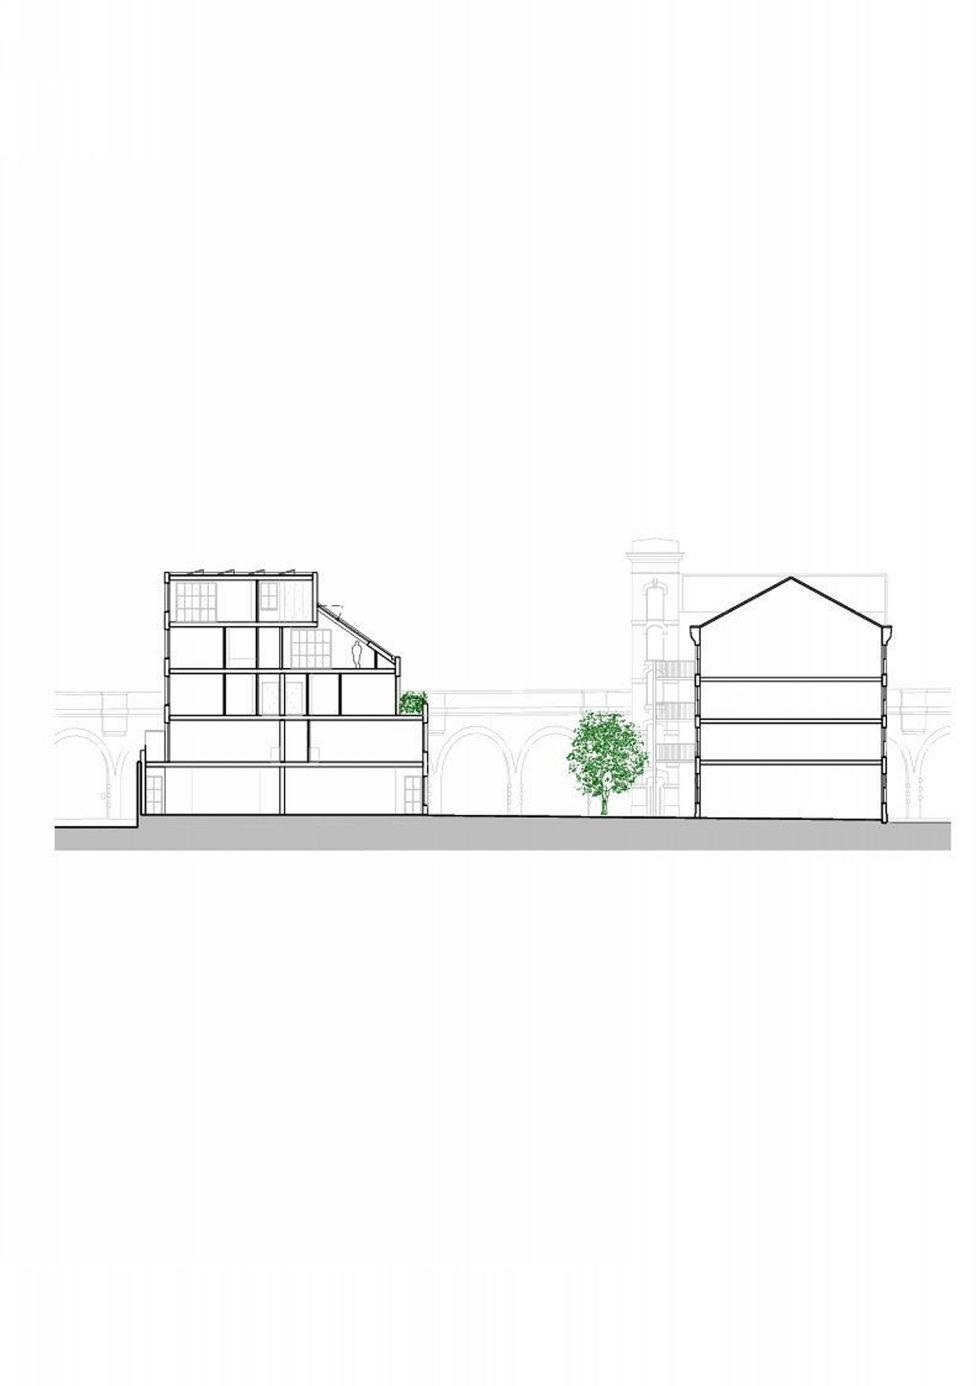 Koops Mill by Mark Fairhurst Architects Plan 3